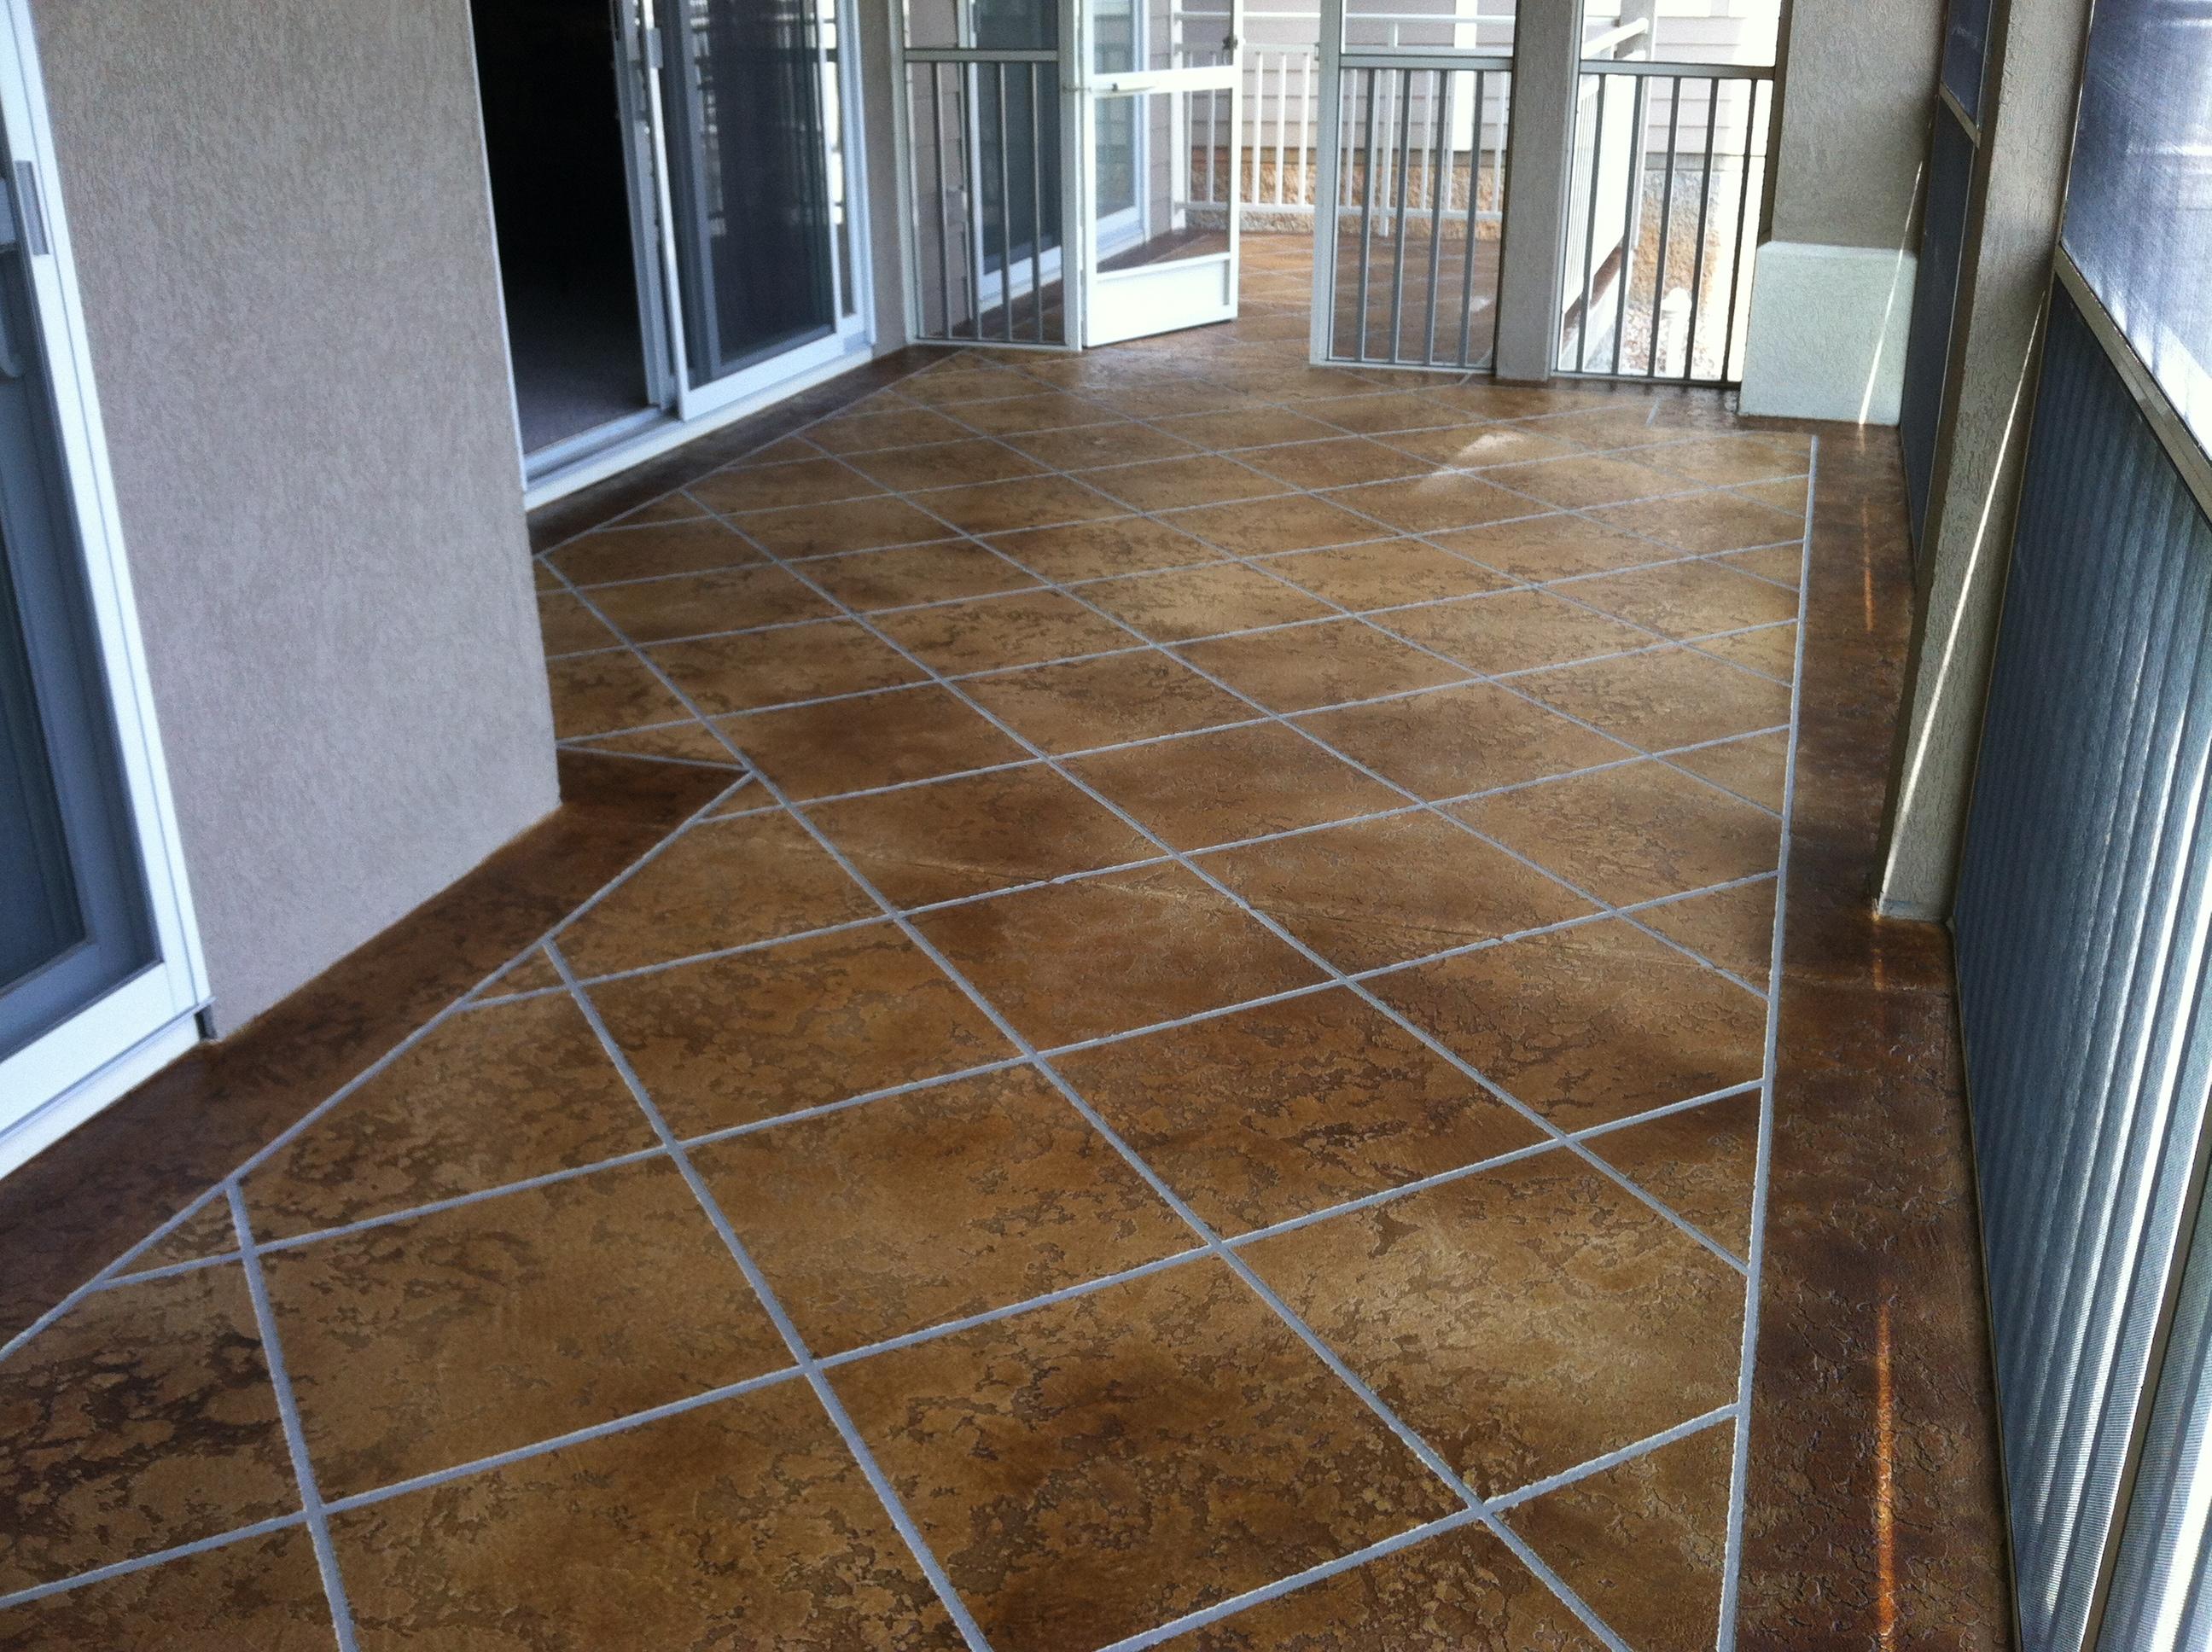 Architectural Concrete Floor : Anderson job